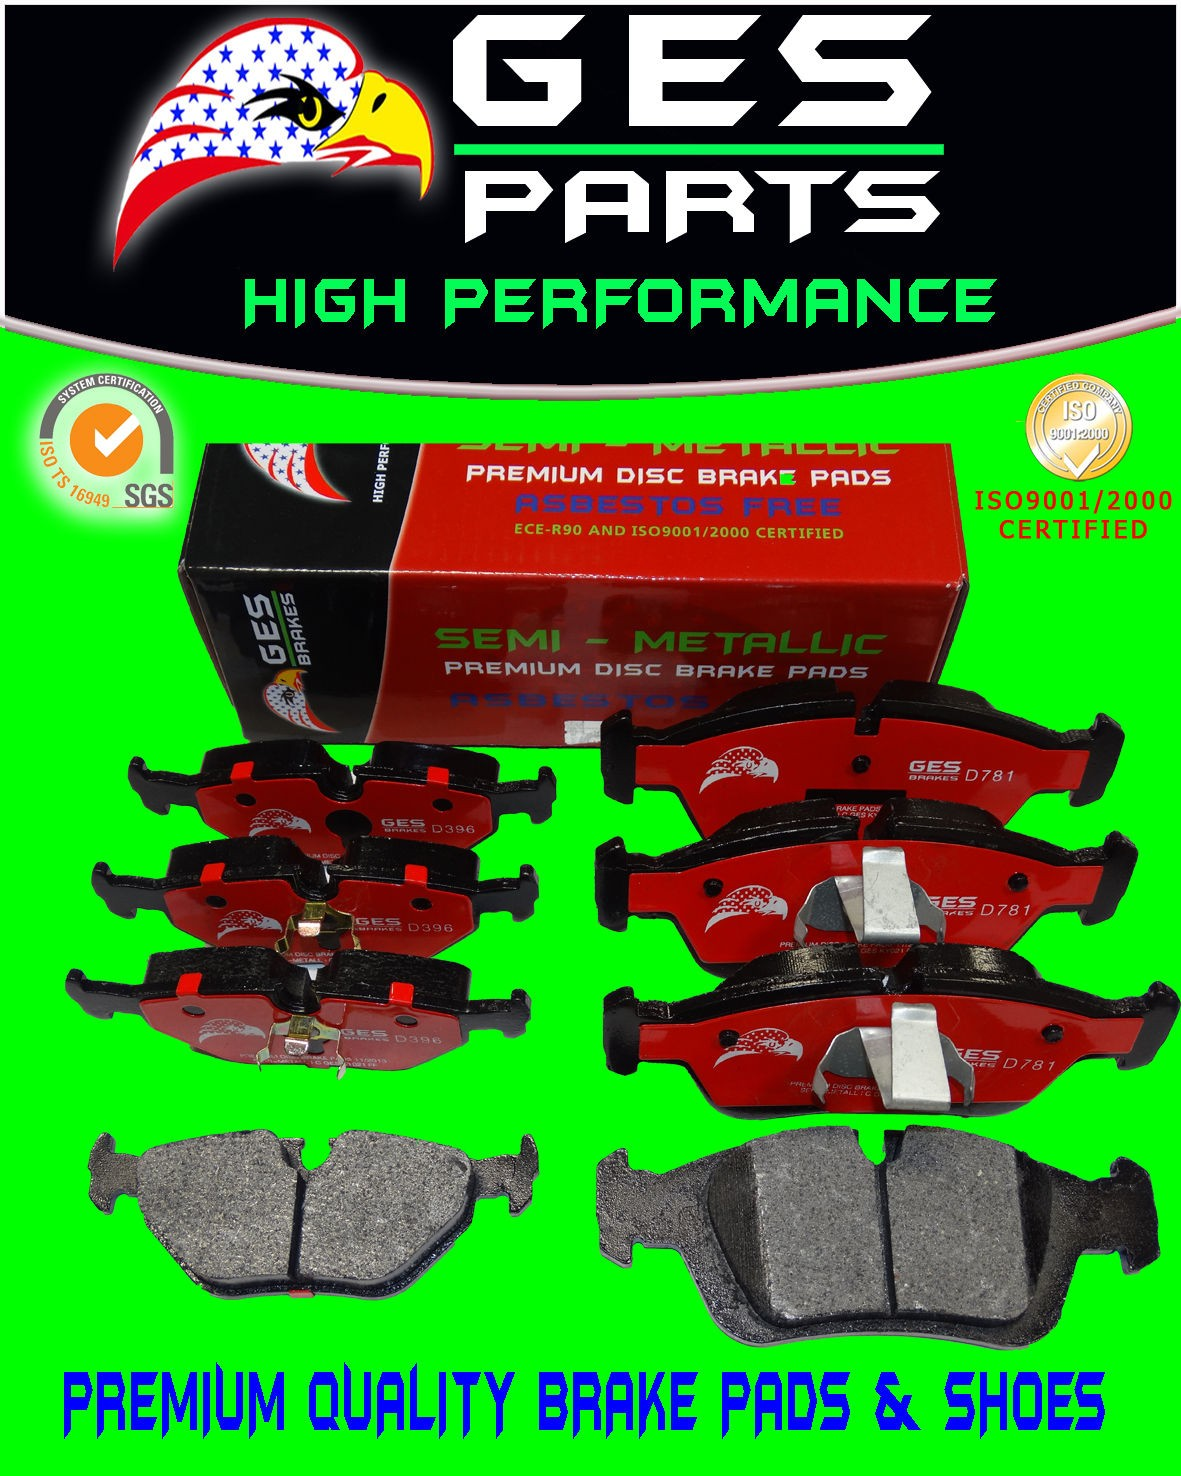 Premium Quality 2 Front & Rear Brake Pads BMW 318i 318is 318ti 323Ci 323i 323iC  323is 328i 325Ci 325i 325is 325xi Z4 D781 & D396